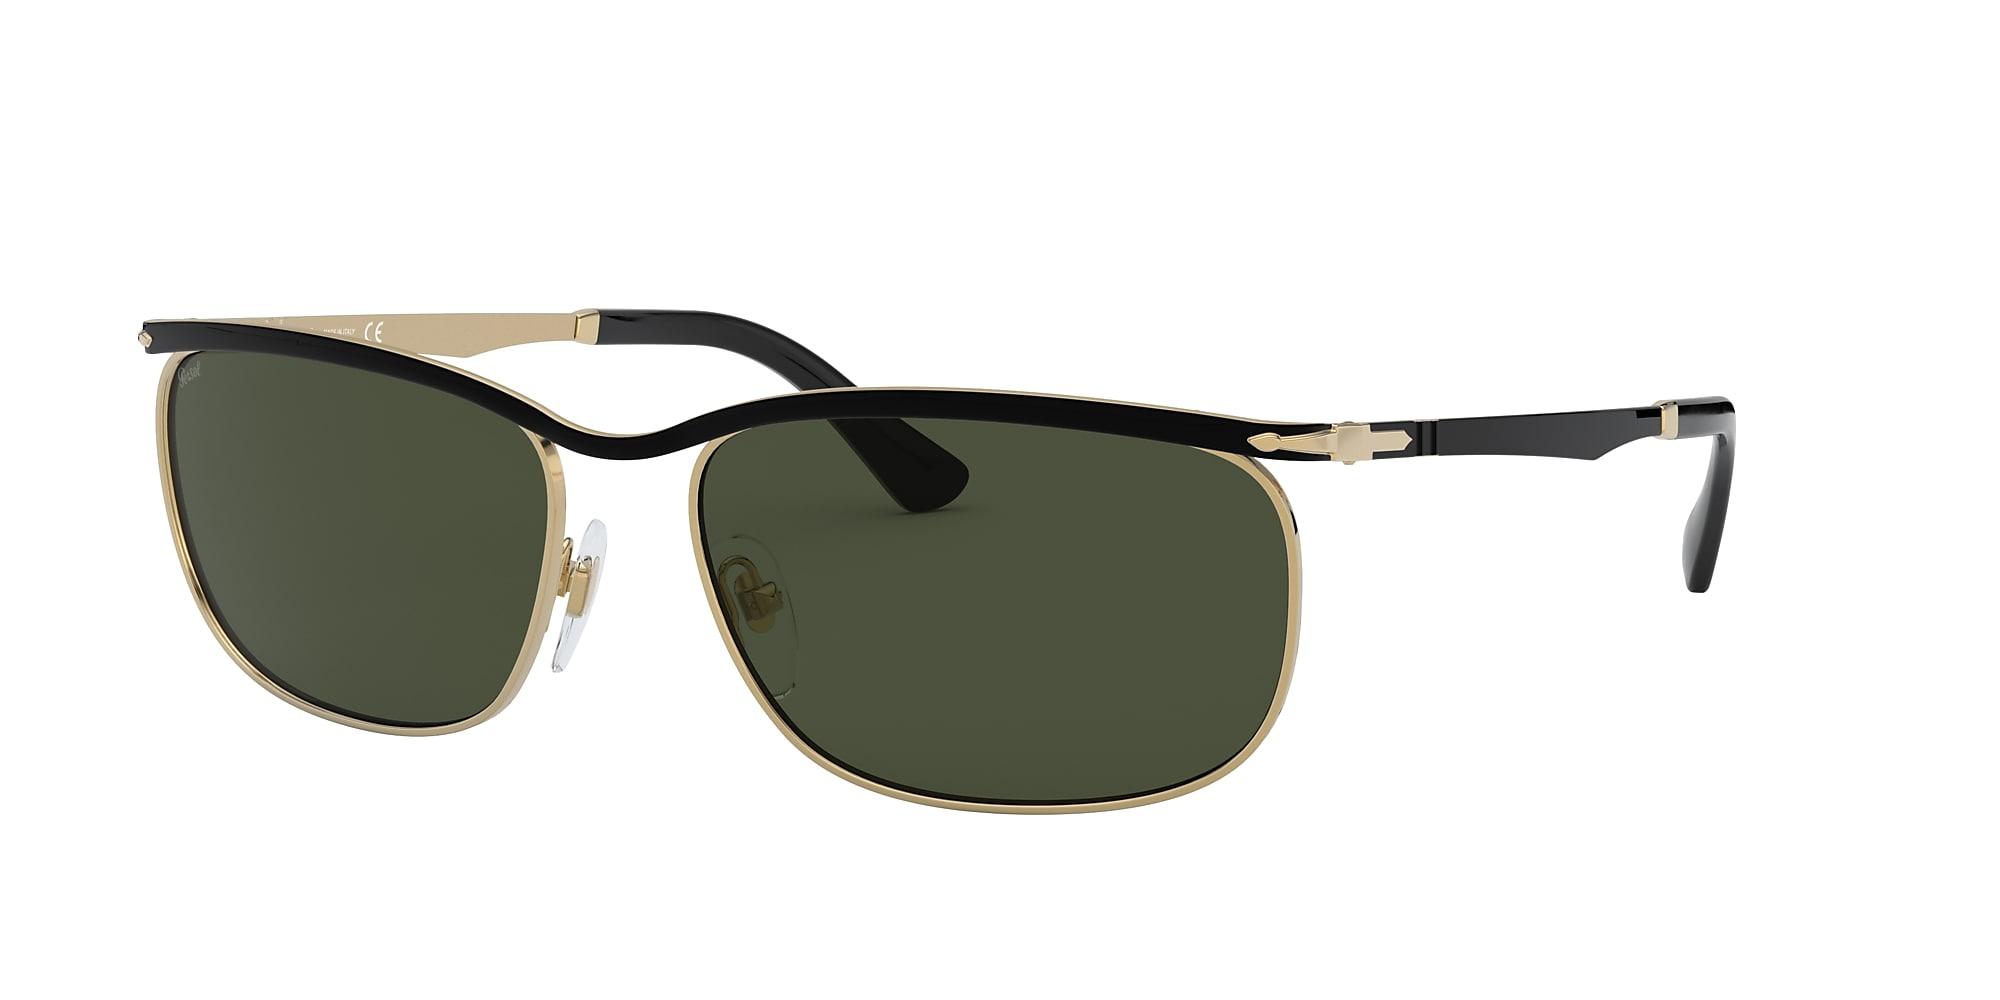 sonnenbrille herren klassiker grünes glas metallrahmen square